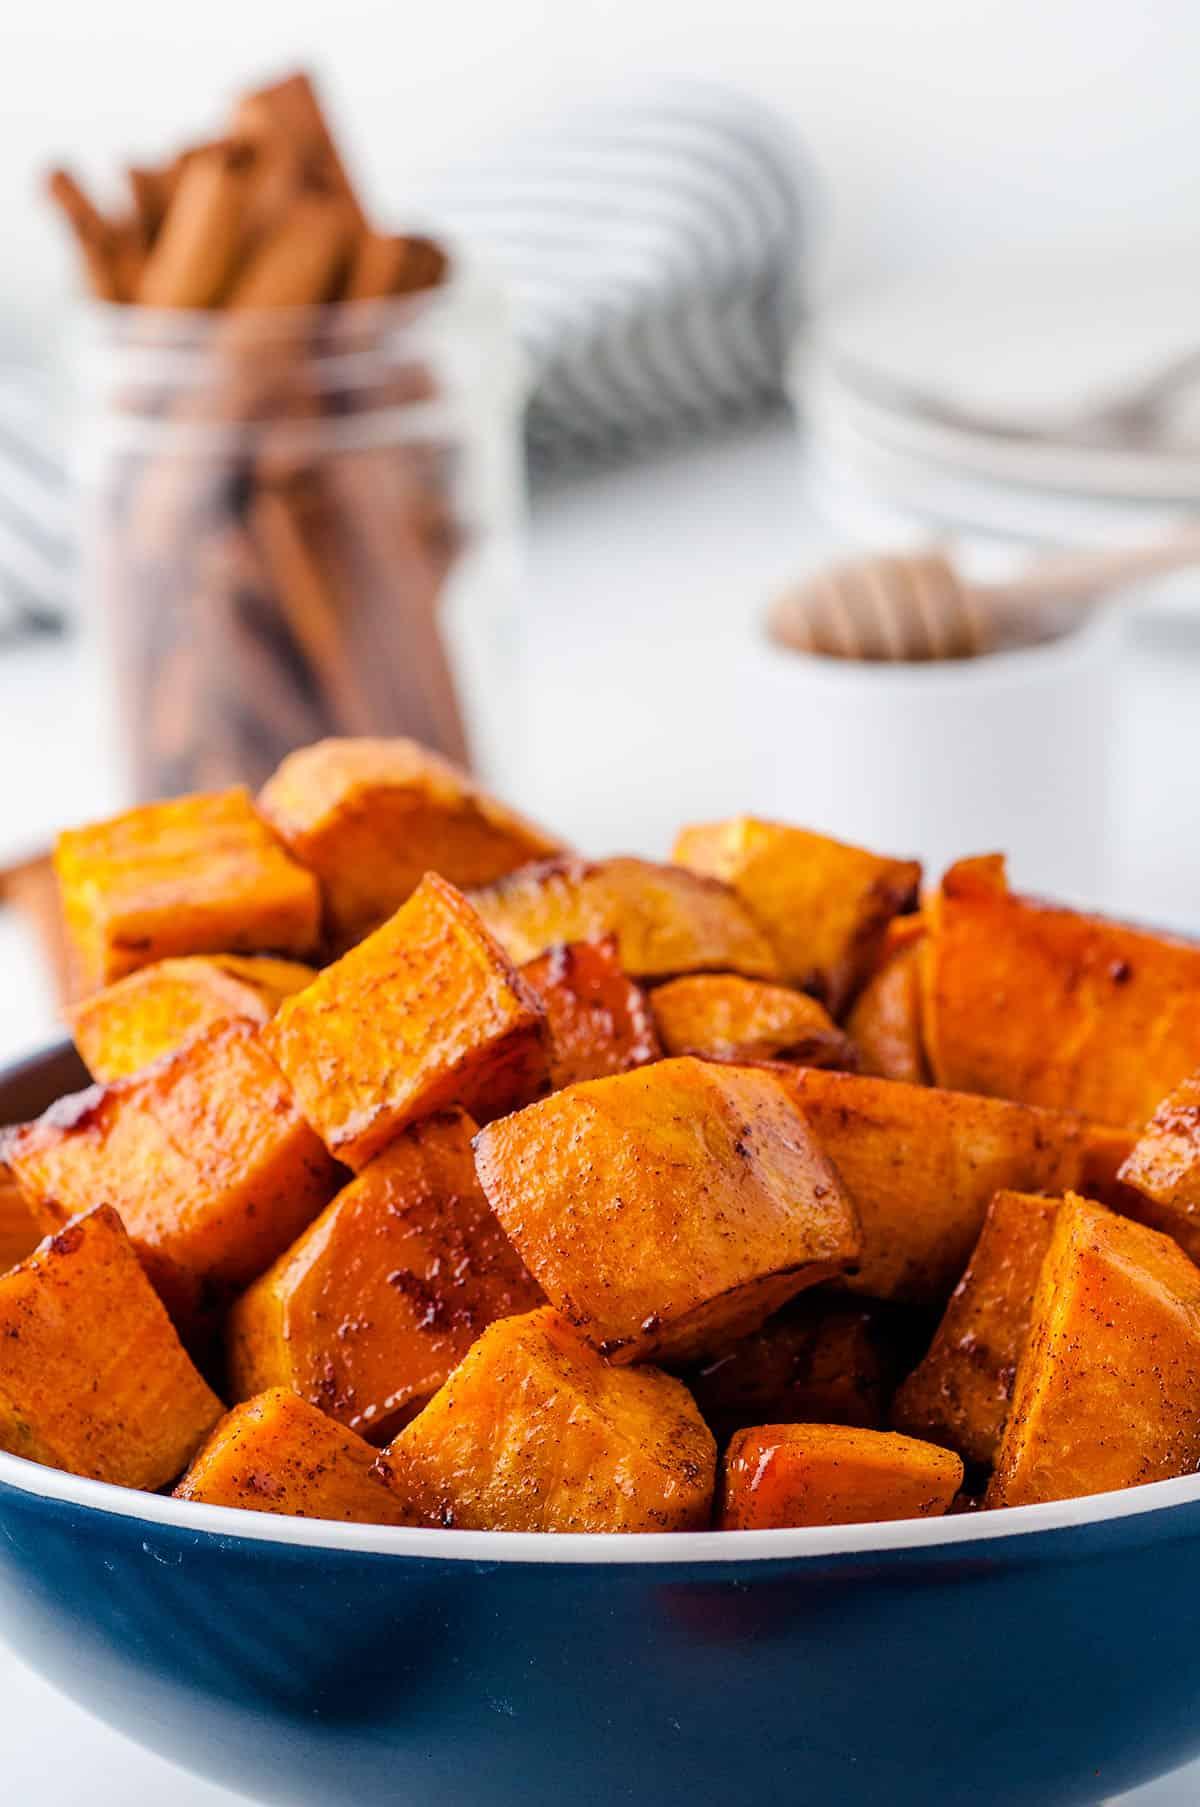 honey roasted sweet potatoes in blue bowl.